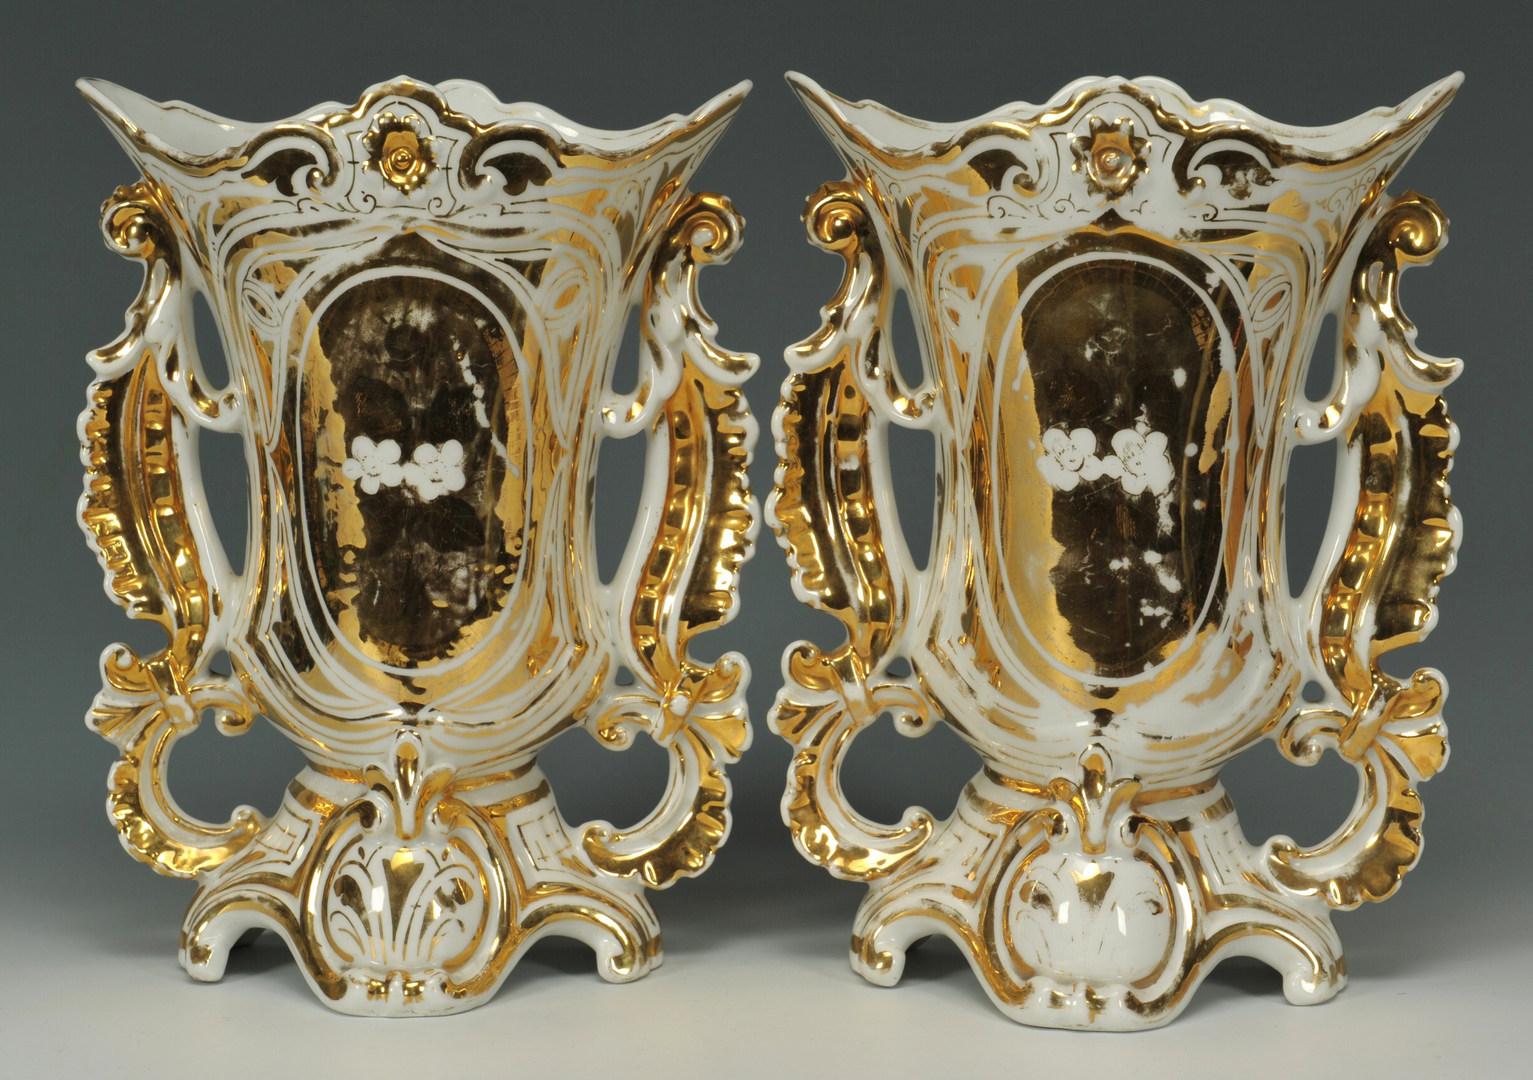 Lot 498: Old Paris Three Piece Garniture Set